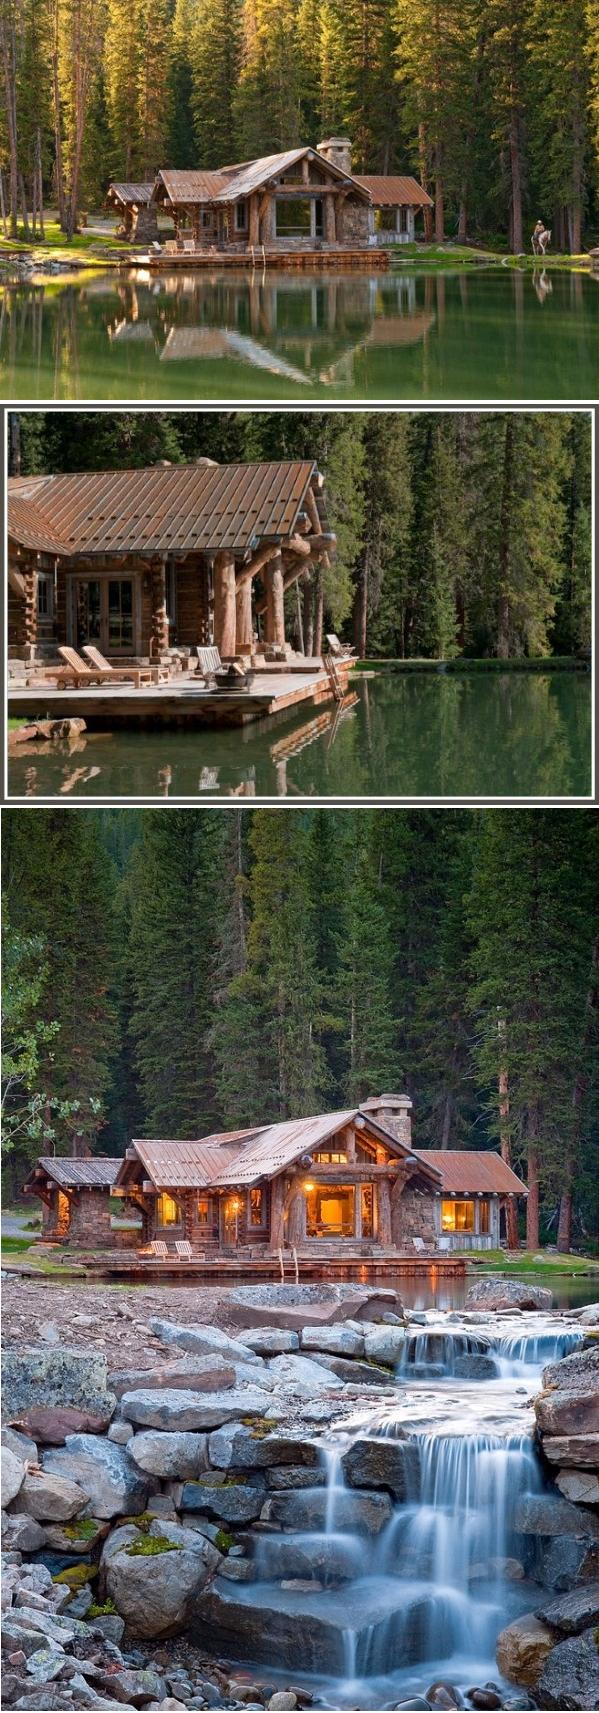 Headwaters Camp Sky Montana